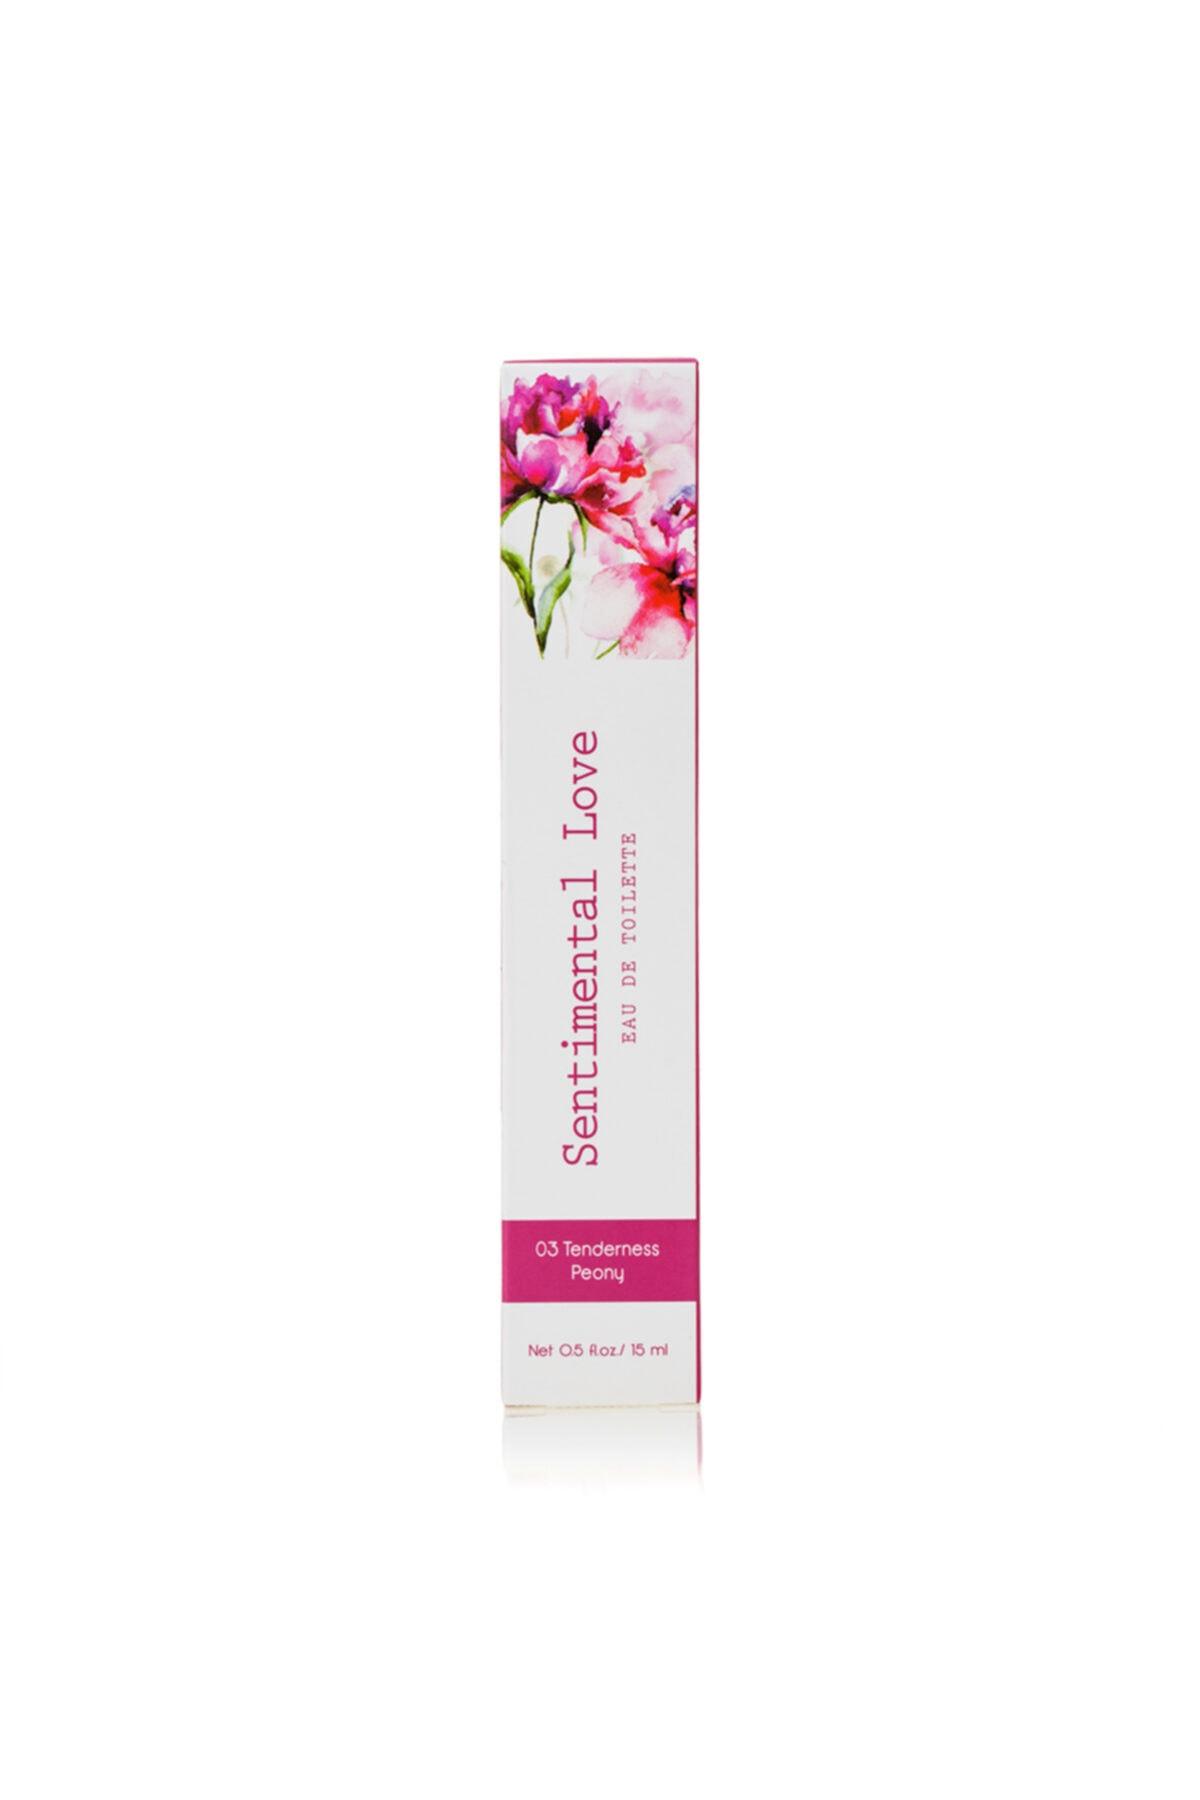 Miniso Mınıso Kadın Parfüm (03 Tenderness Peony) 15ml 2